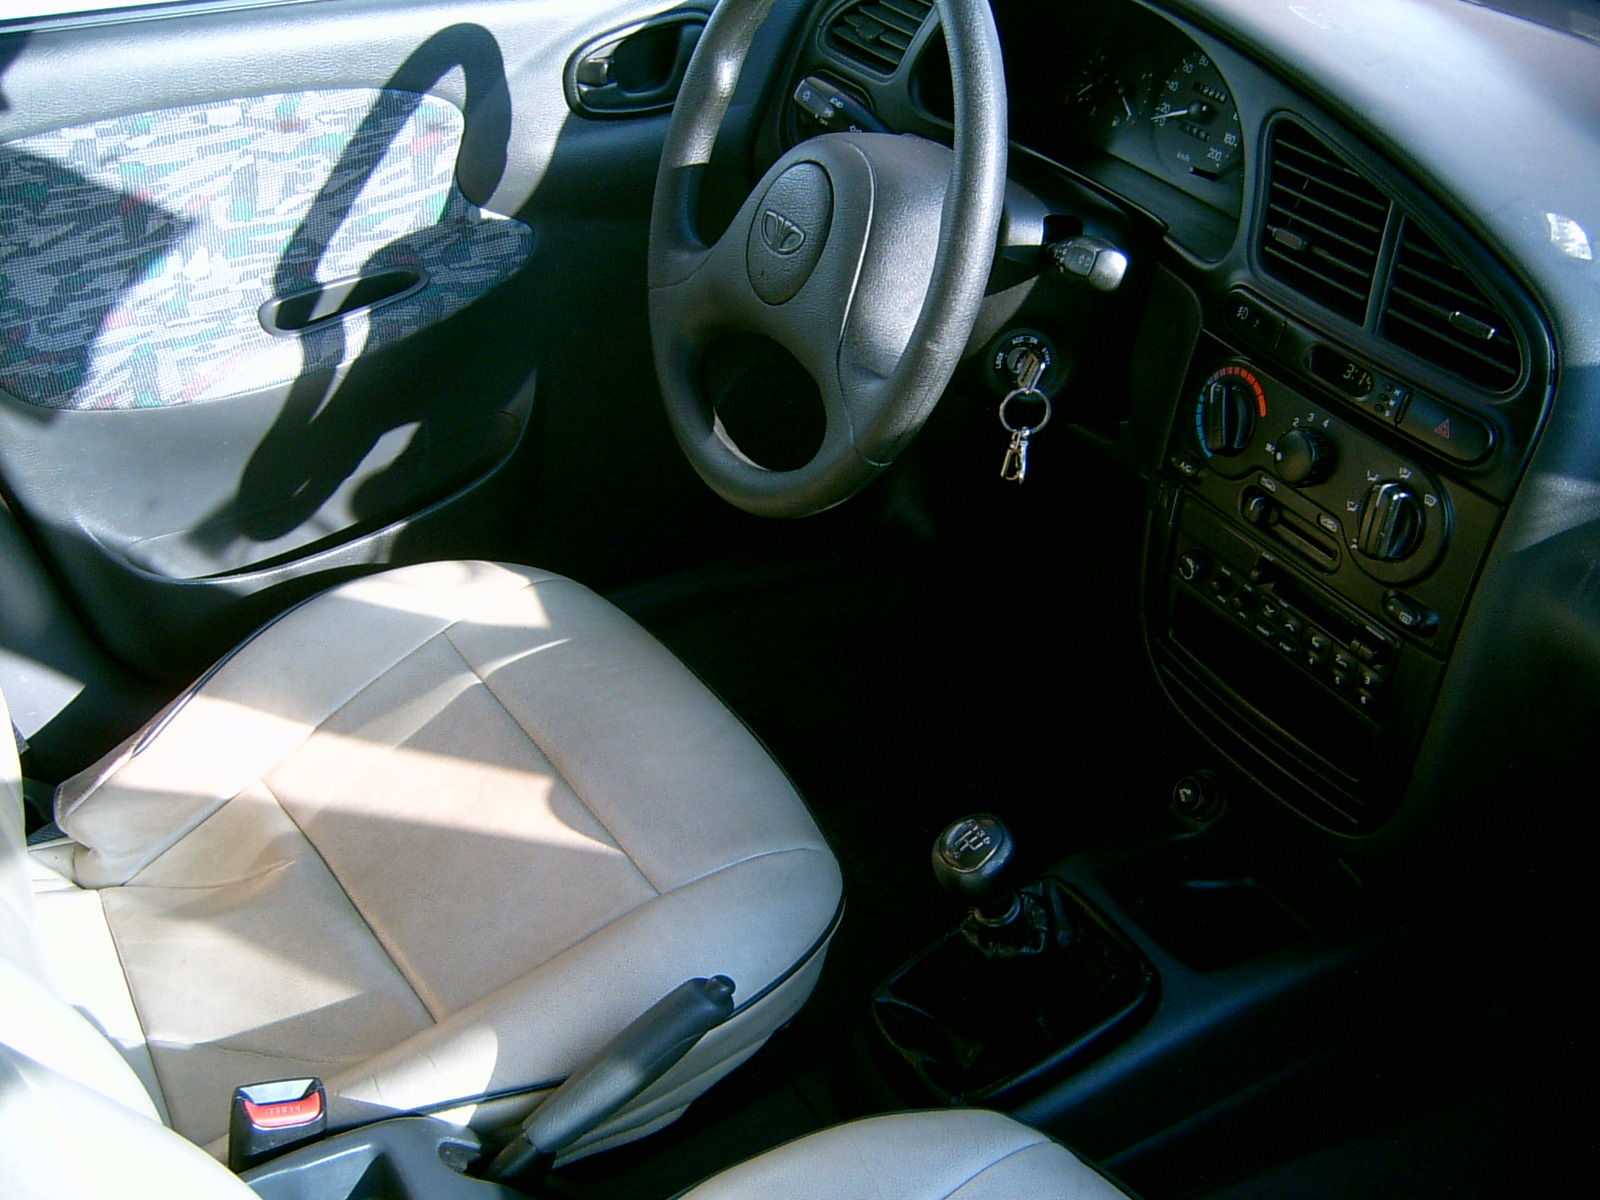 Ford Scorpio Sedan 1992 further 5 door hatchback further 3 also 4739 1999 Daewoo Lanos 8 as well Honda Jazzfit 2002. on daewoo hatchback